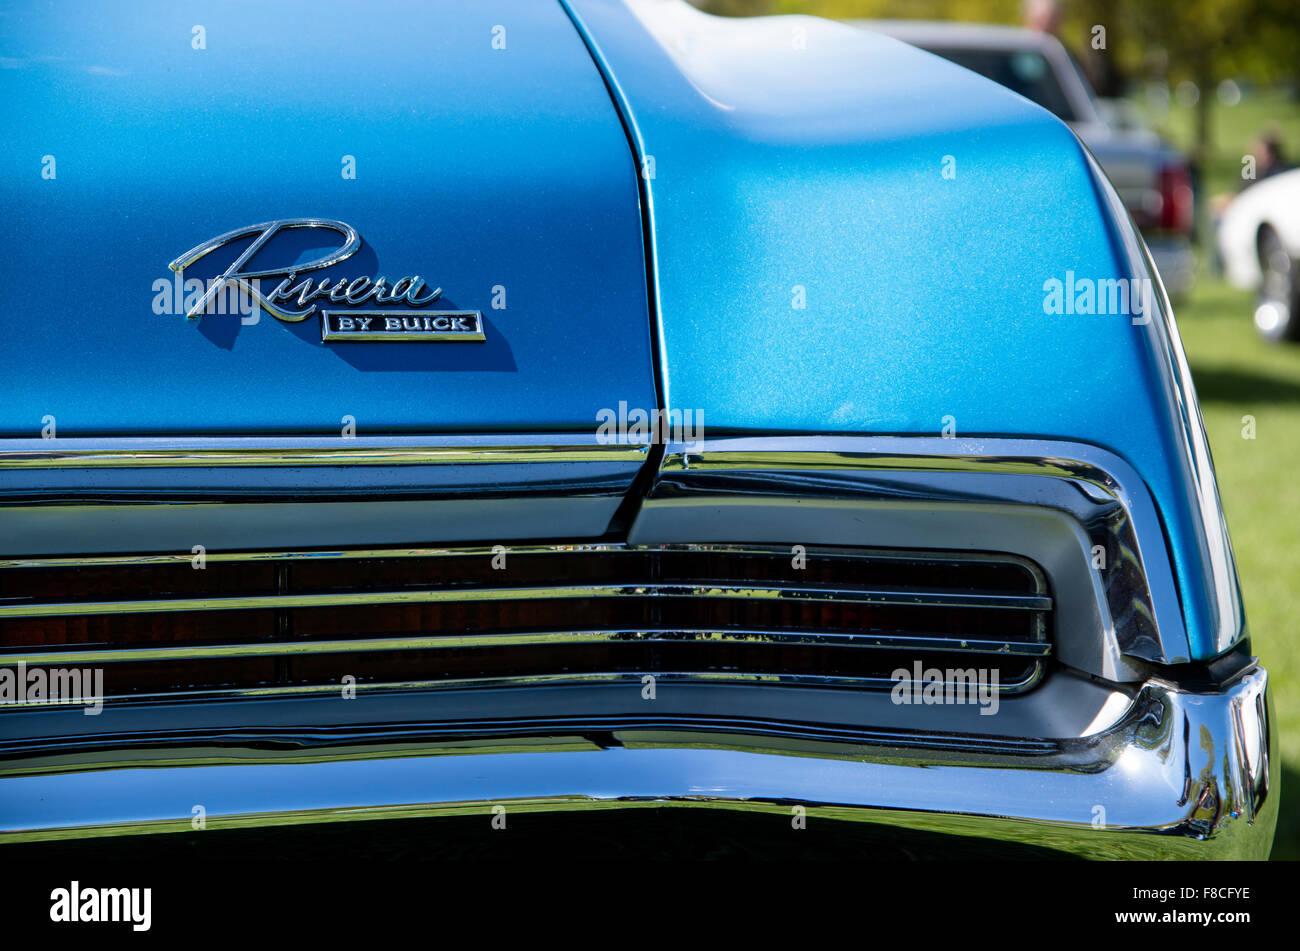 Buick Logo Stockfotos & Buick Logo Bilder - Alamy